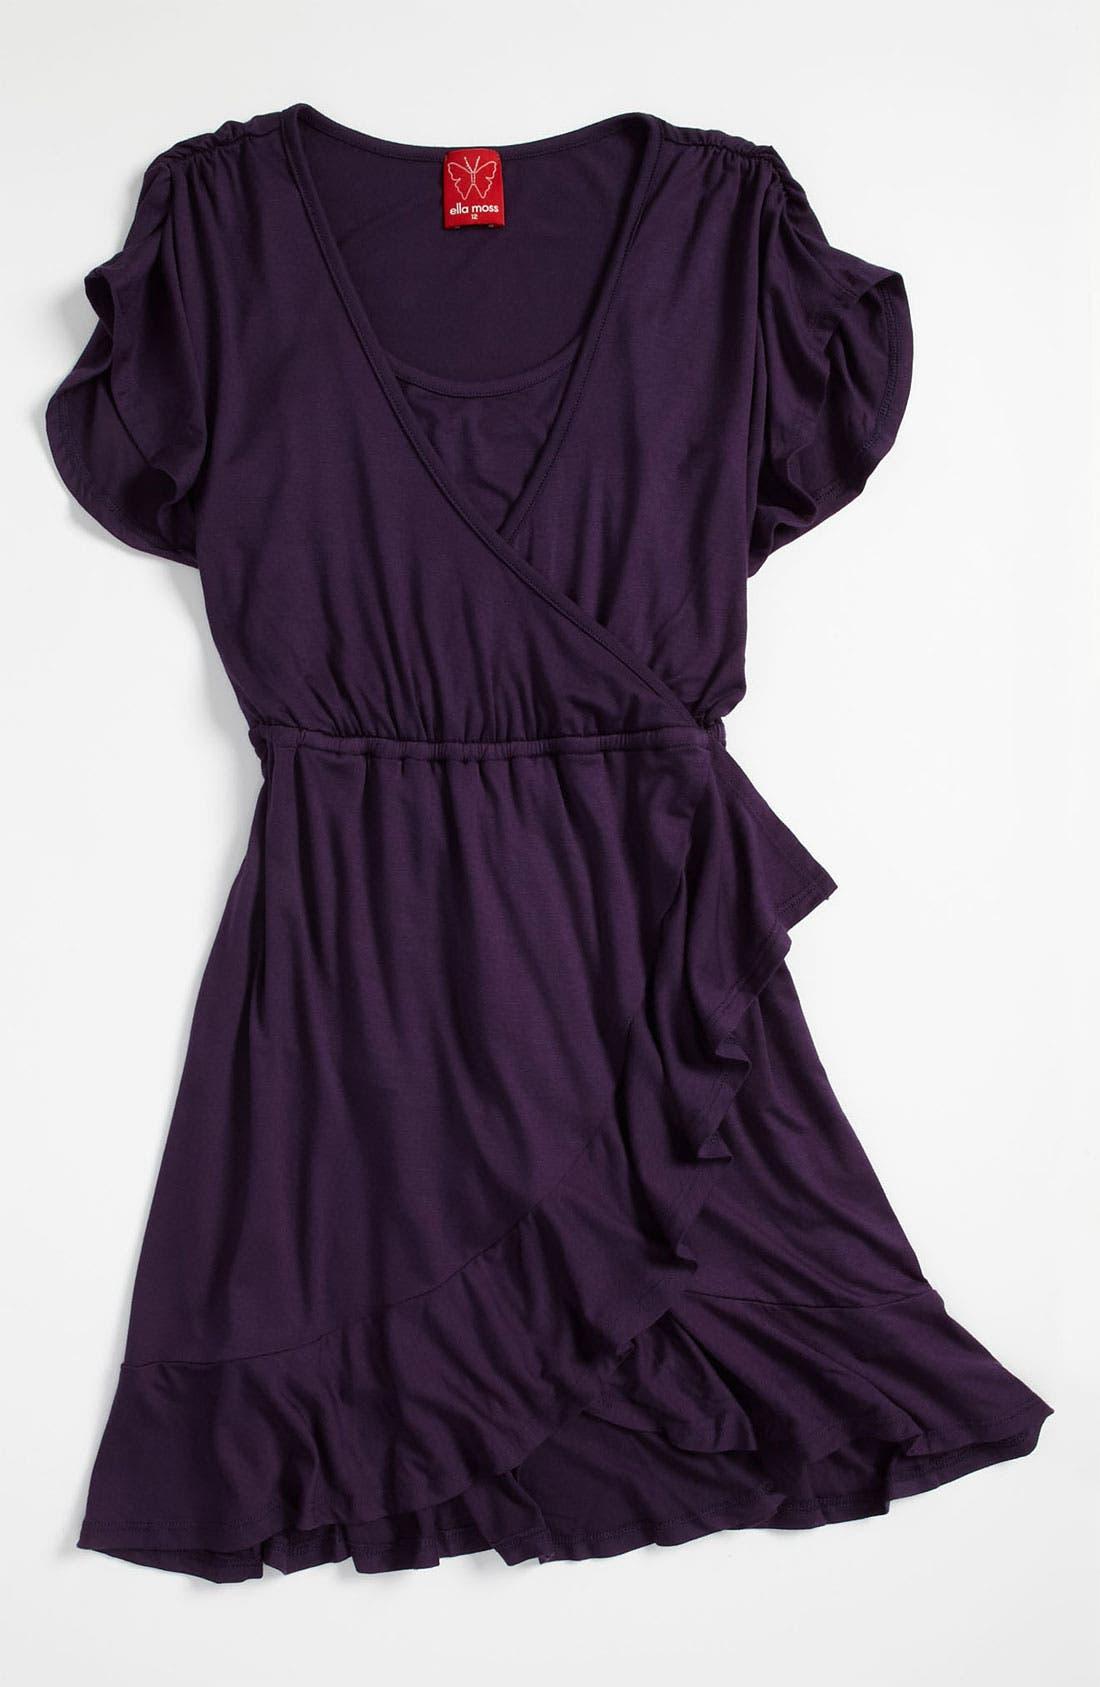 Alternate Image 1 Selected - Ella Moss 'Bella' Ruffle Dress (Big Girls)